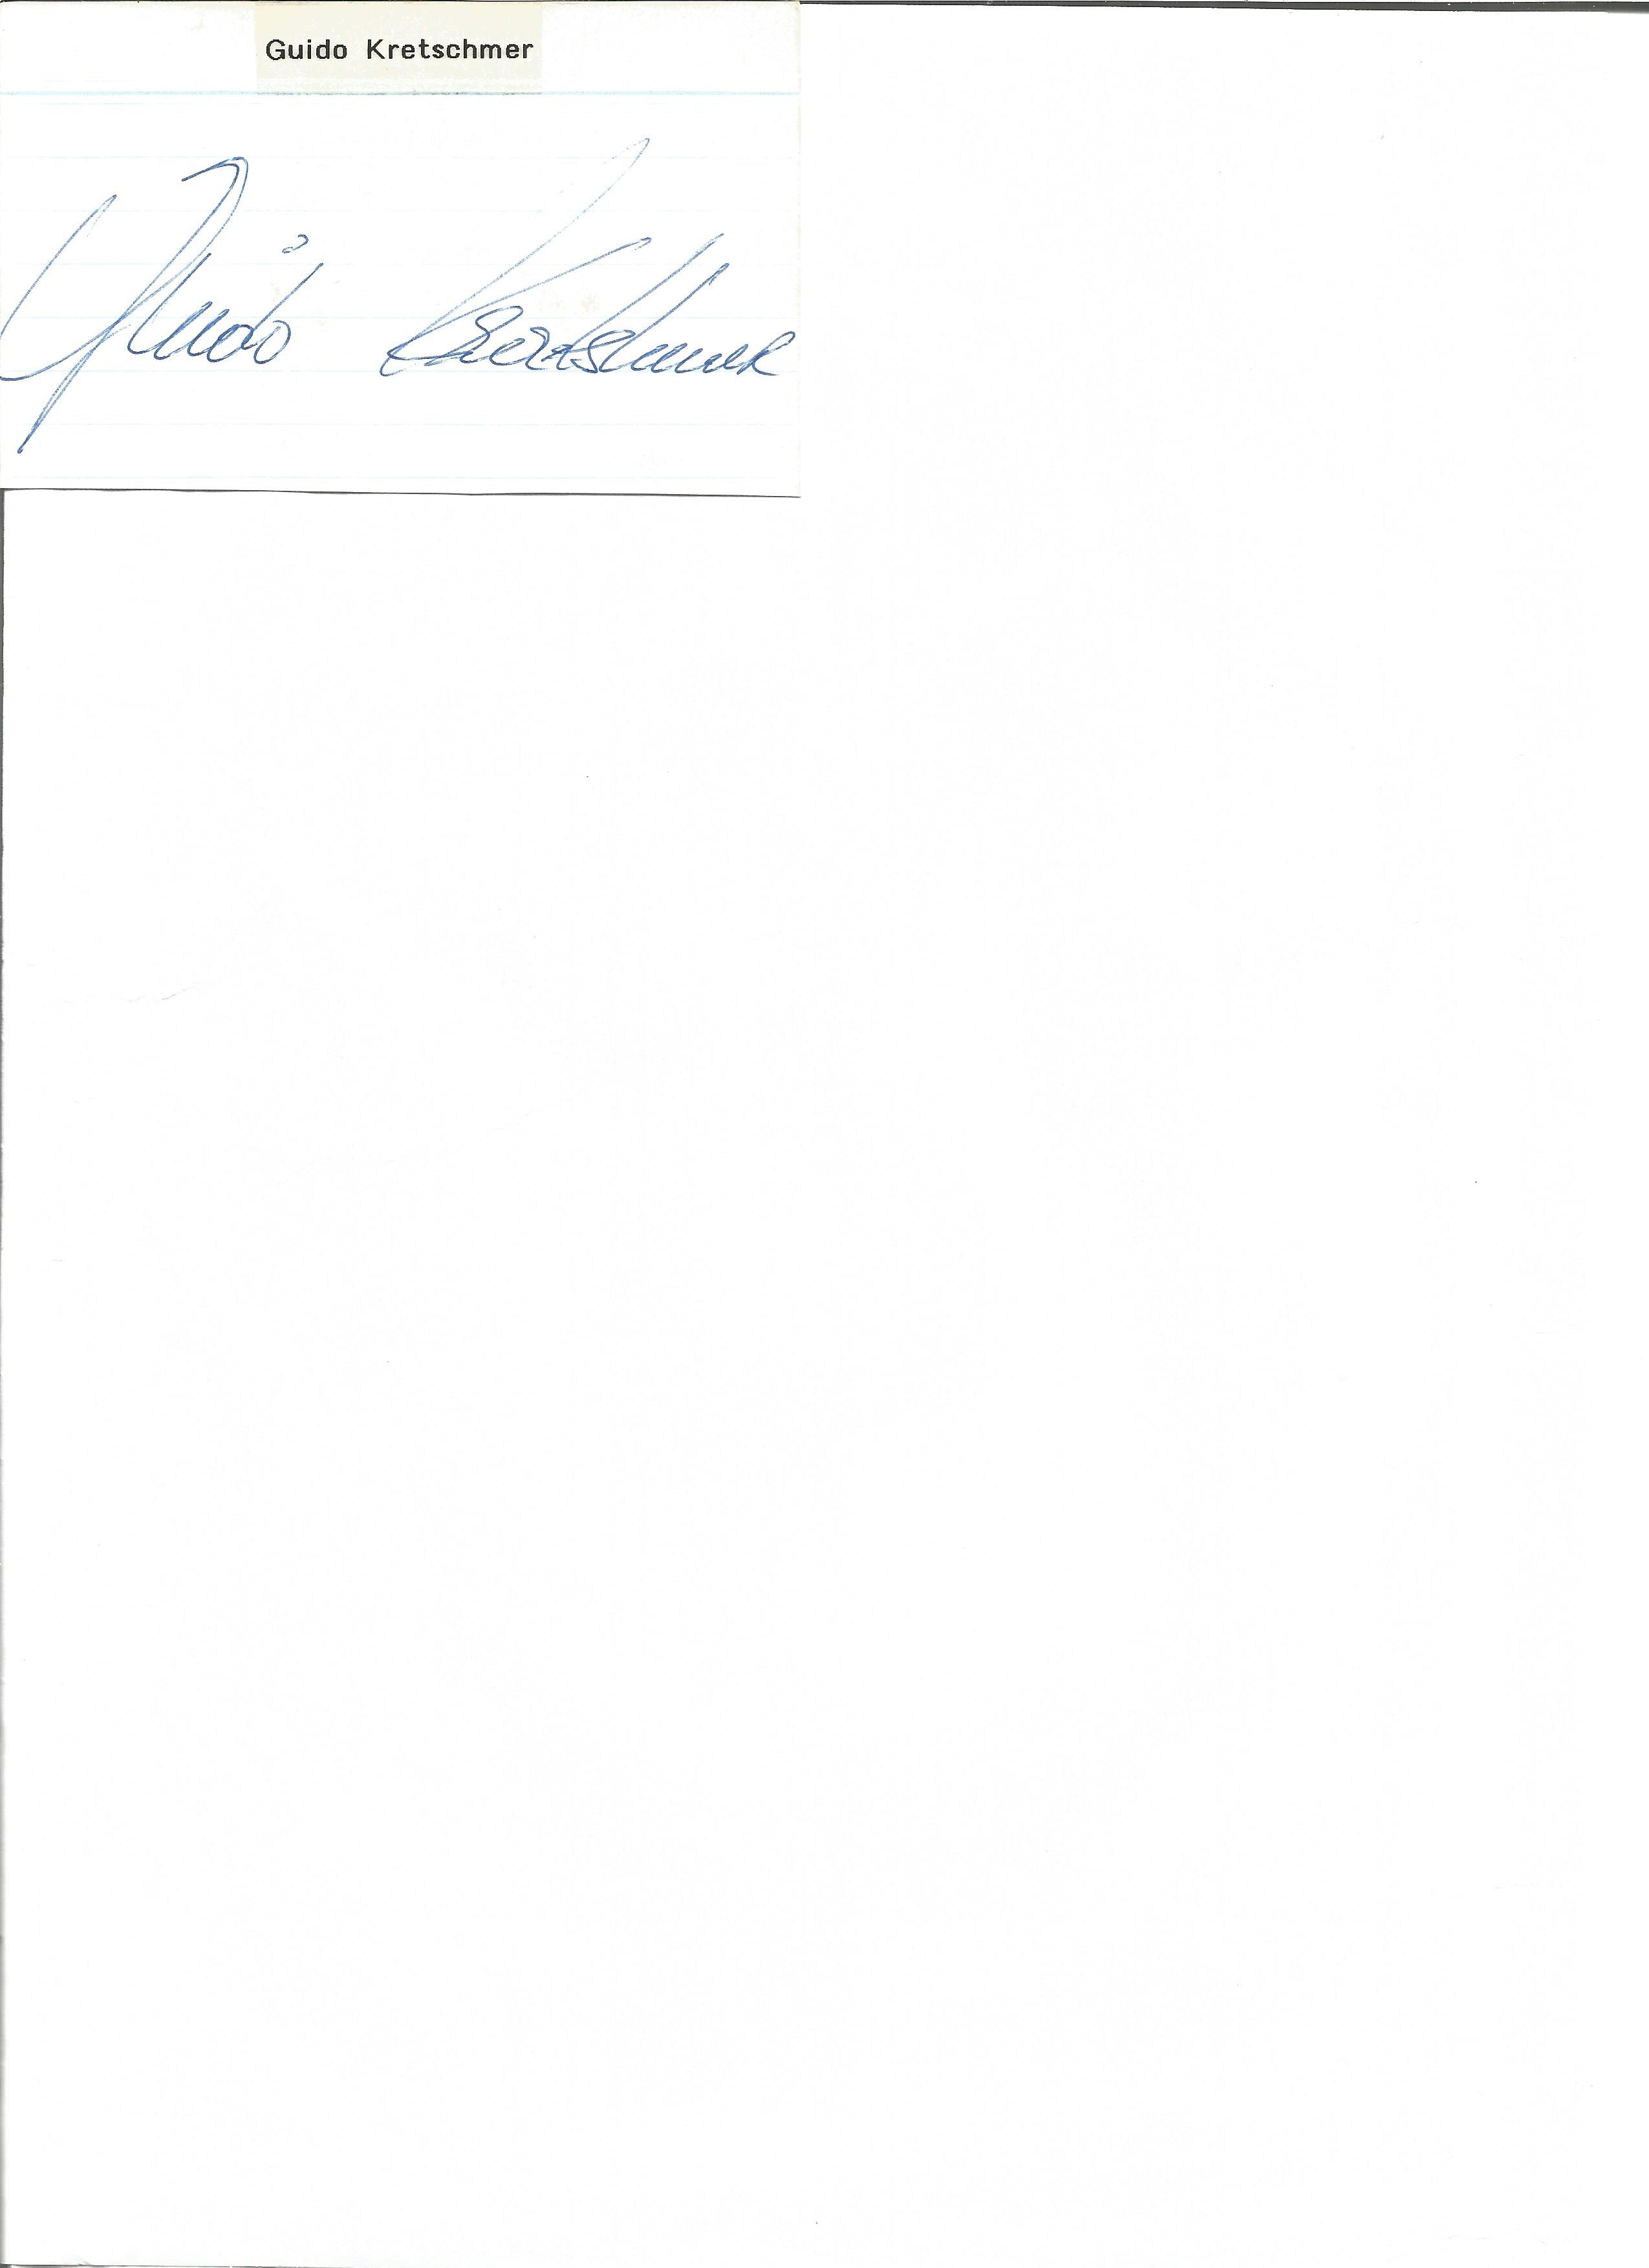 Lot 183 - Athletics Guido Kratschmer signed 4x3 album page. Guido Kratschmer born 10 January 1953 in